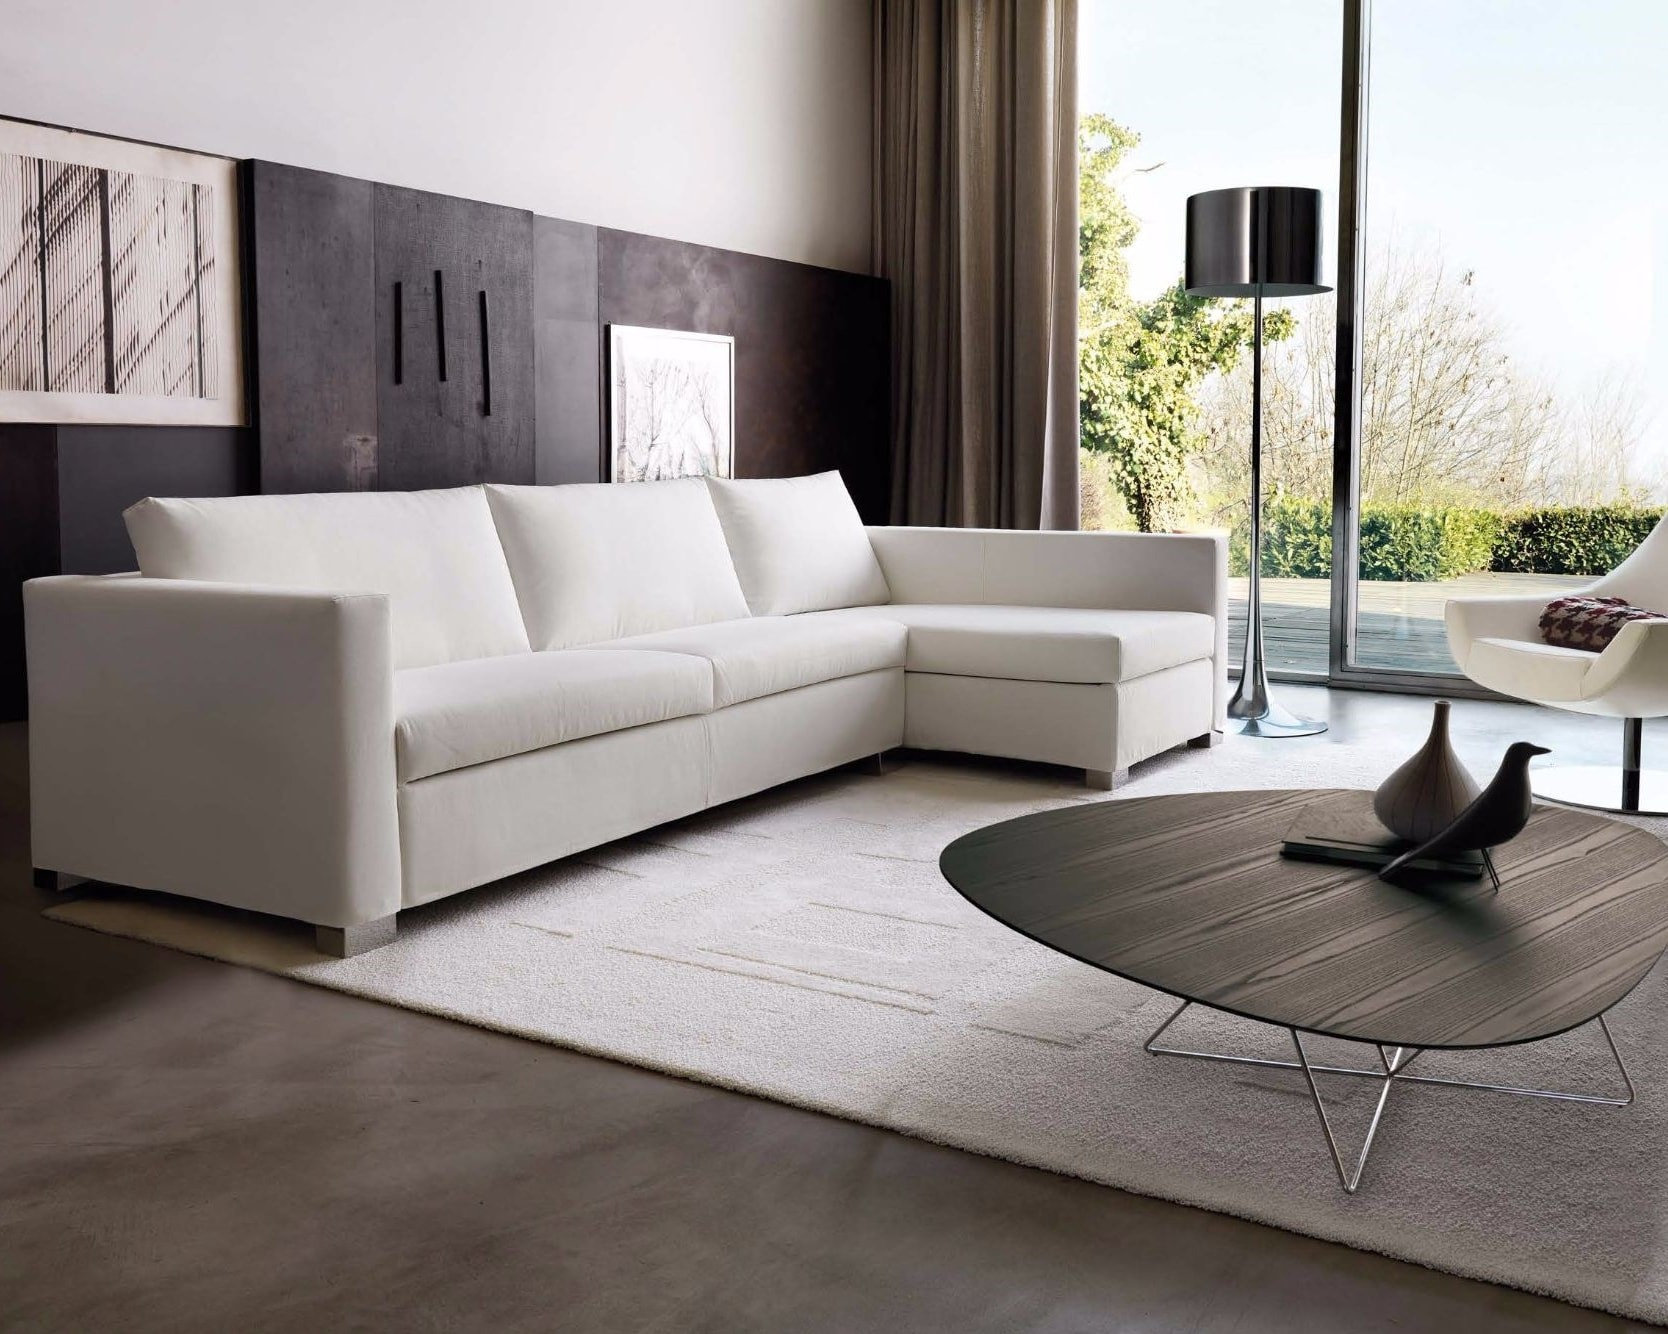 desiree furniture. Prev Desiree Furniture